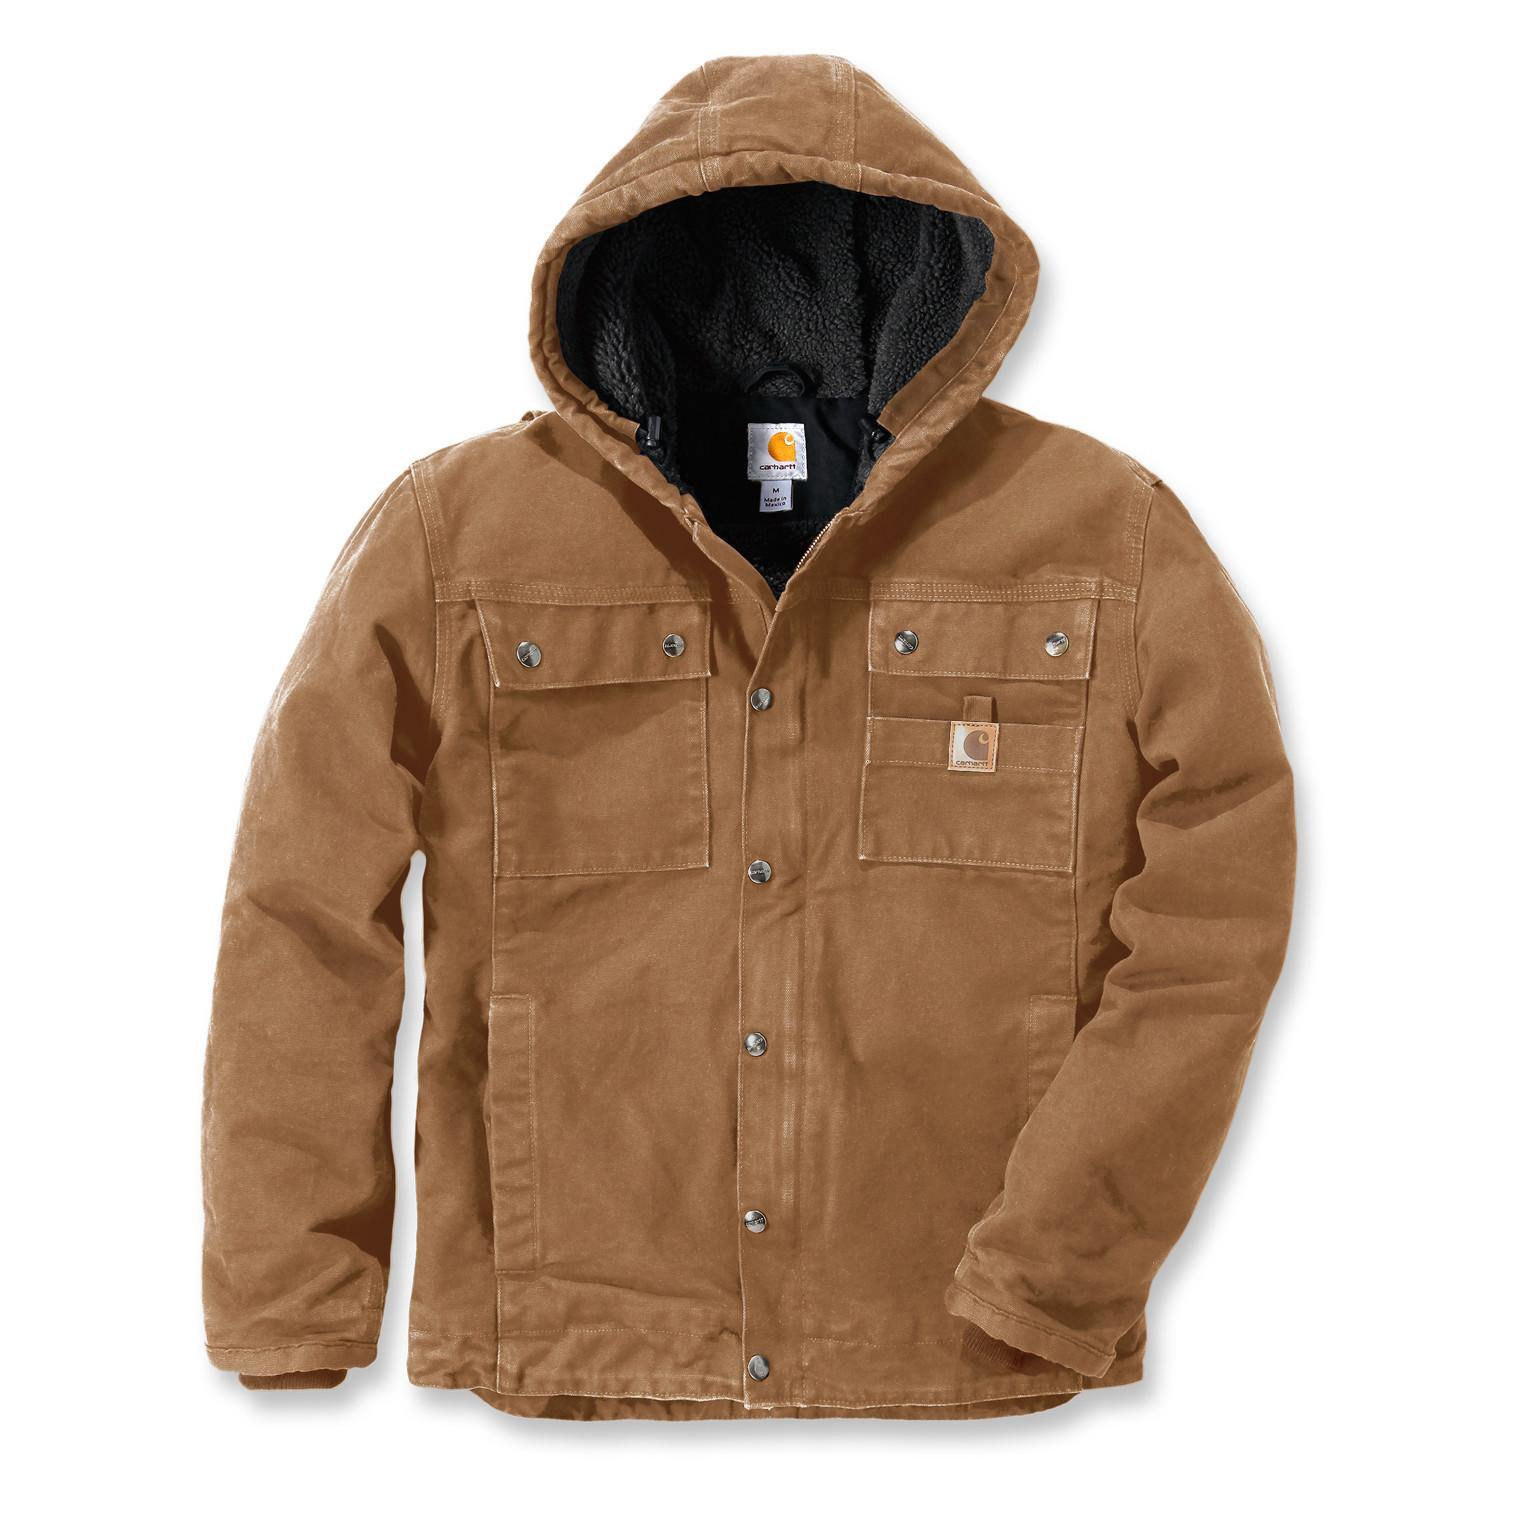 Куртка котоновая Carhartt Sandstone Barlett Jacket - 102285 (Carhartt Brown, S)